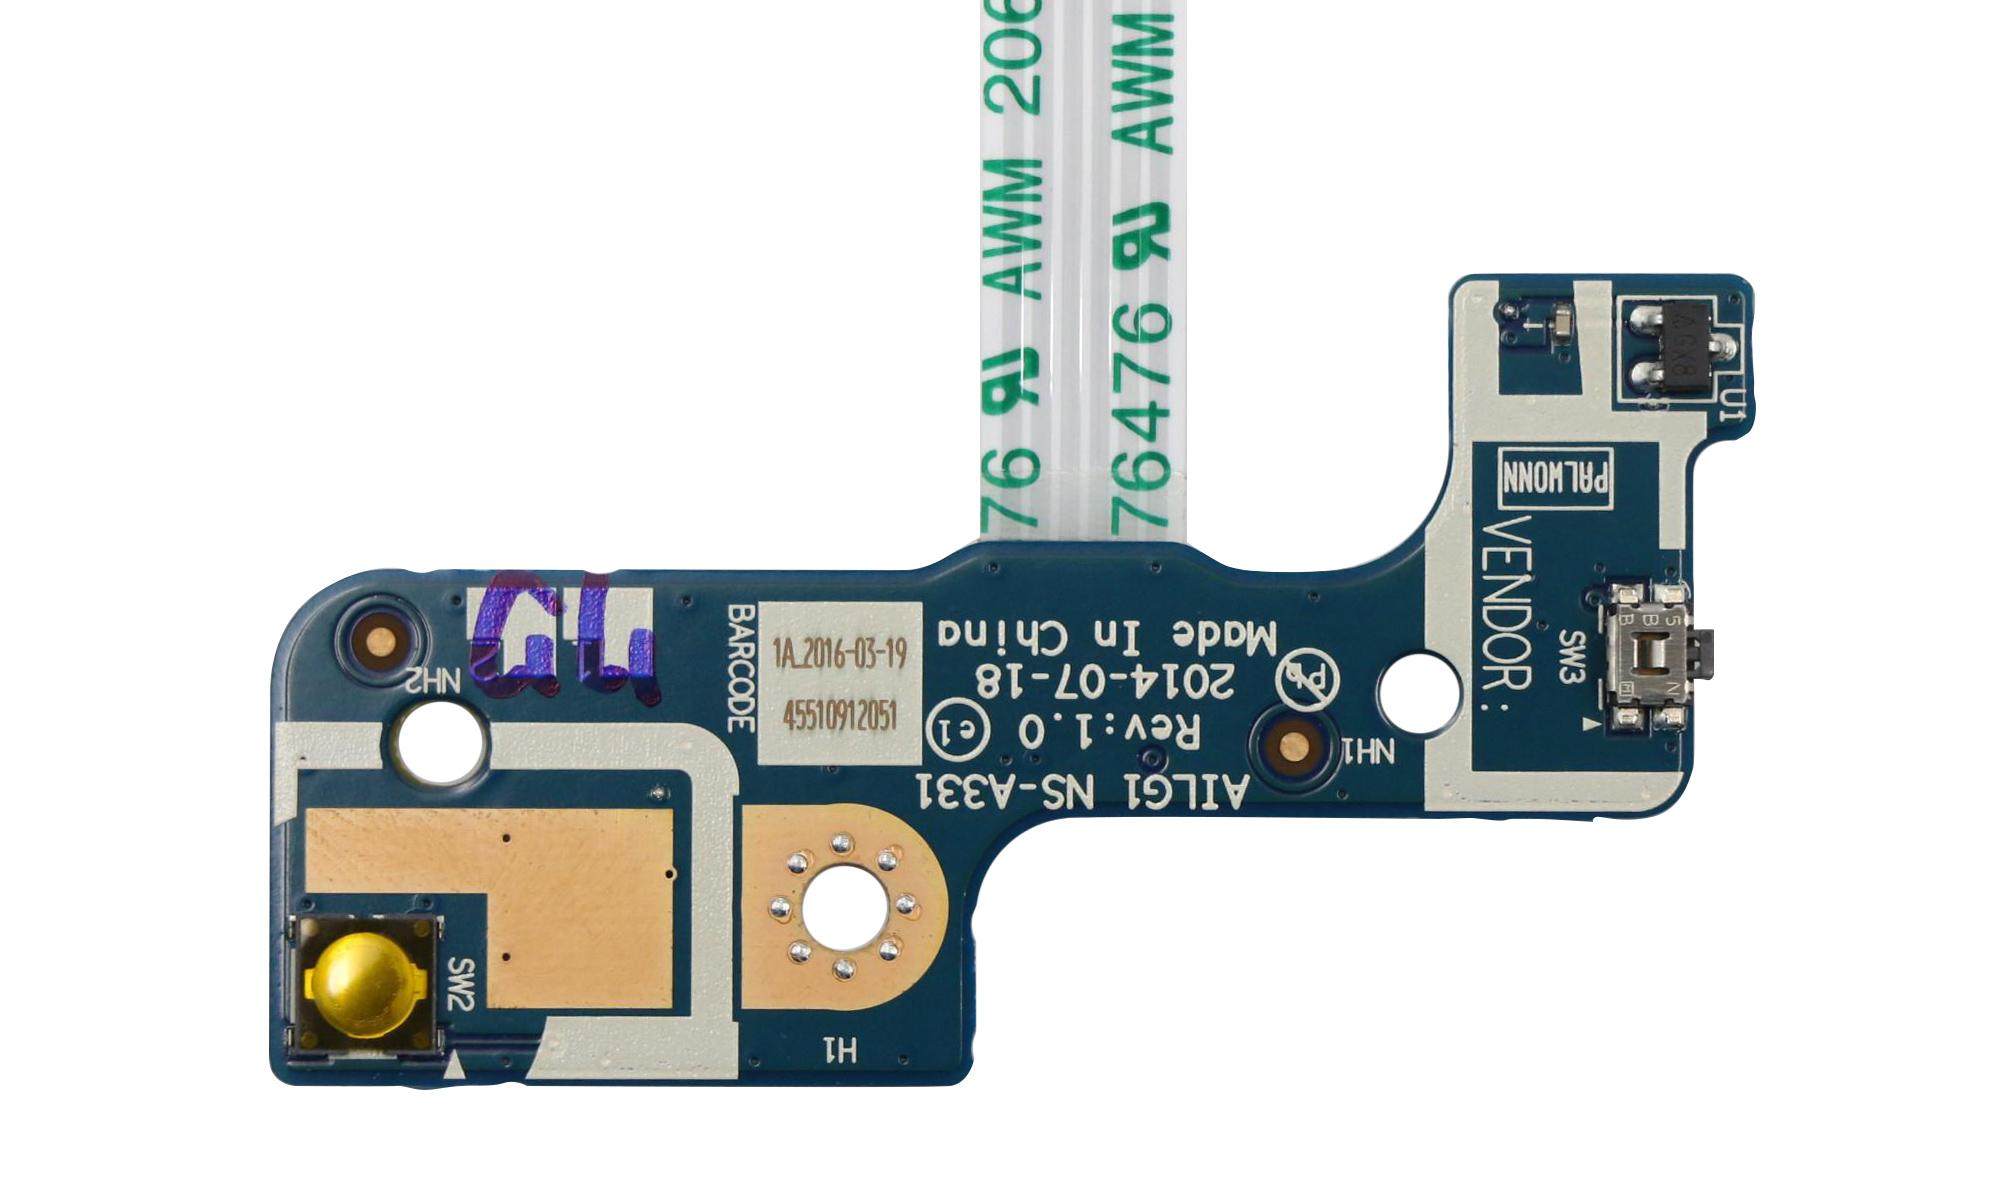 Buton si power board compatibil Lenovo G70-35, G70-70, G70-80, Z70-80, B70-80, model AILG1 NS-A331